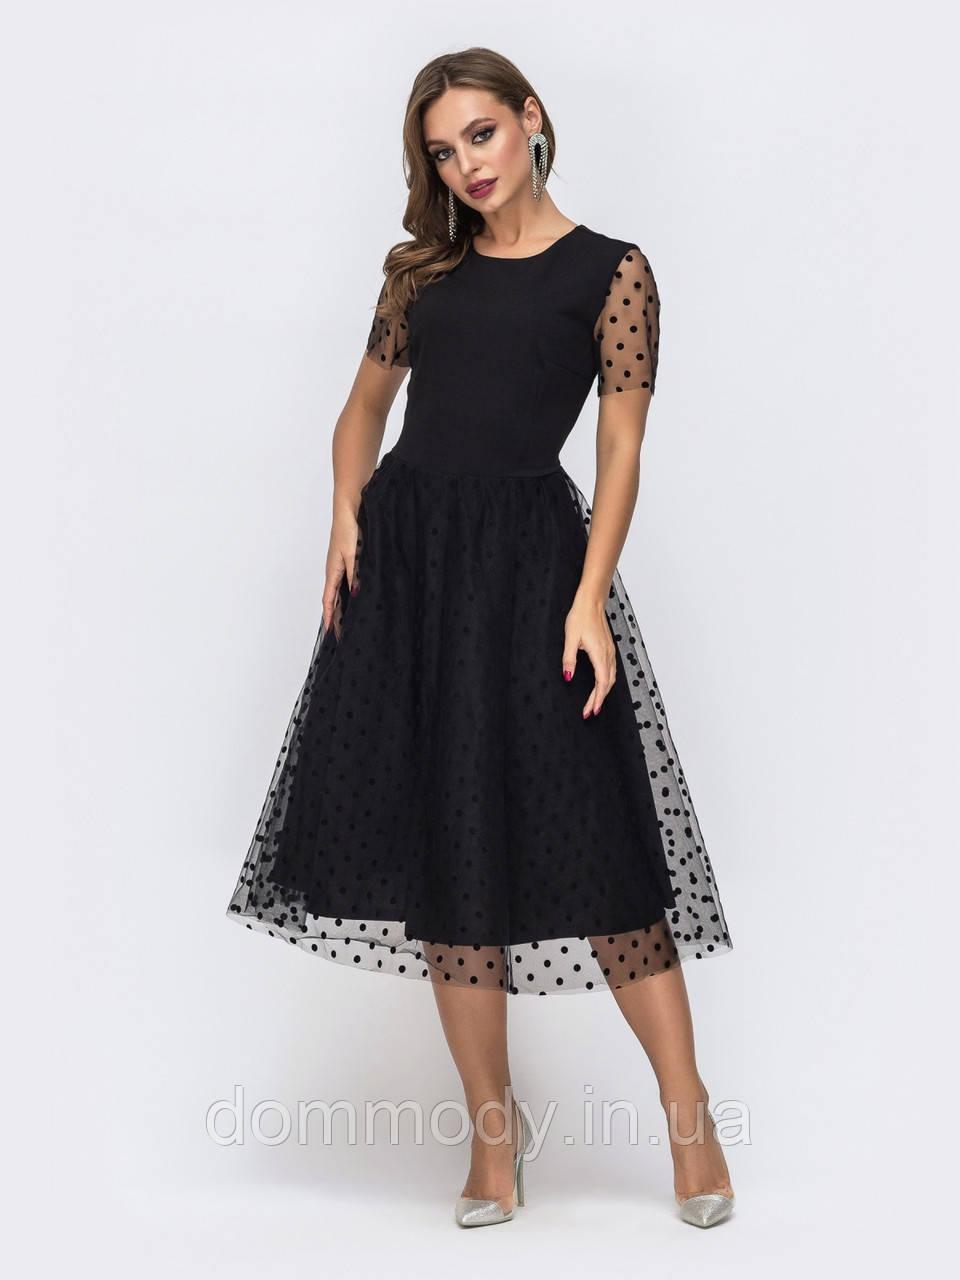 Платье женское Judith black